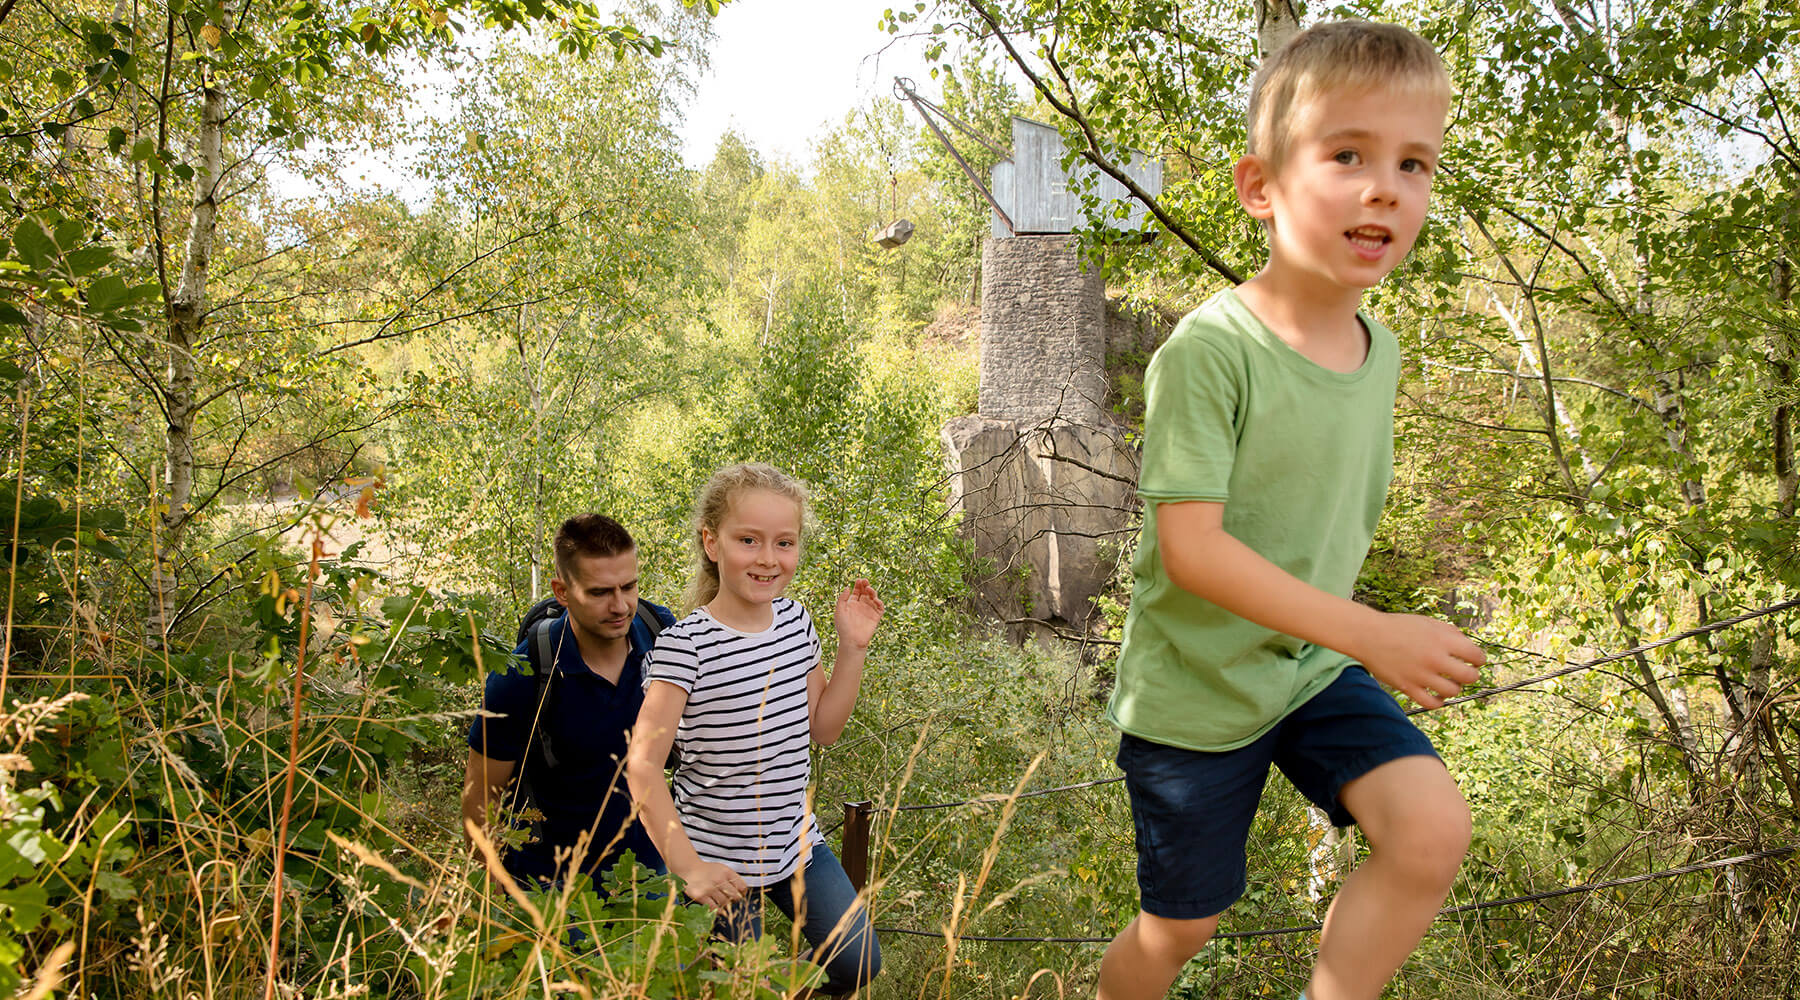 Vulkanpark, Mayener Grubenfeld. Eine Familie wandert im Grubenfeld.